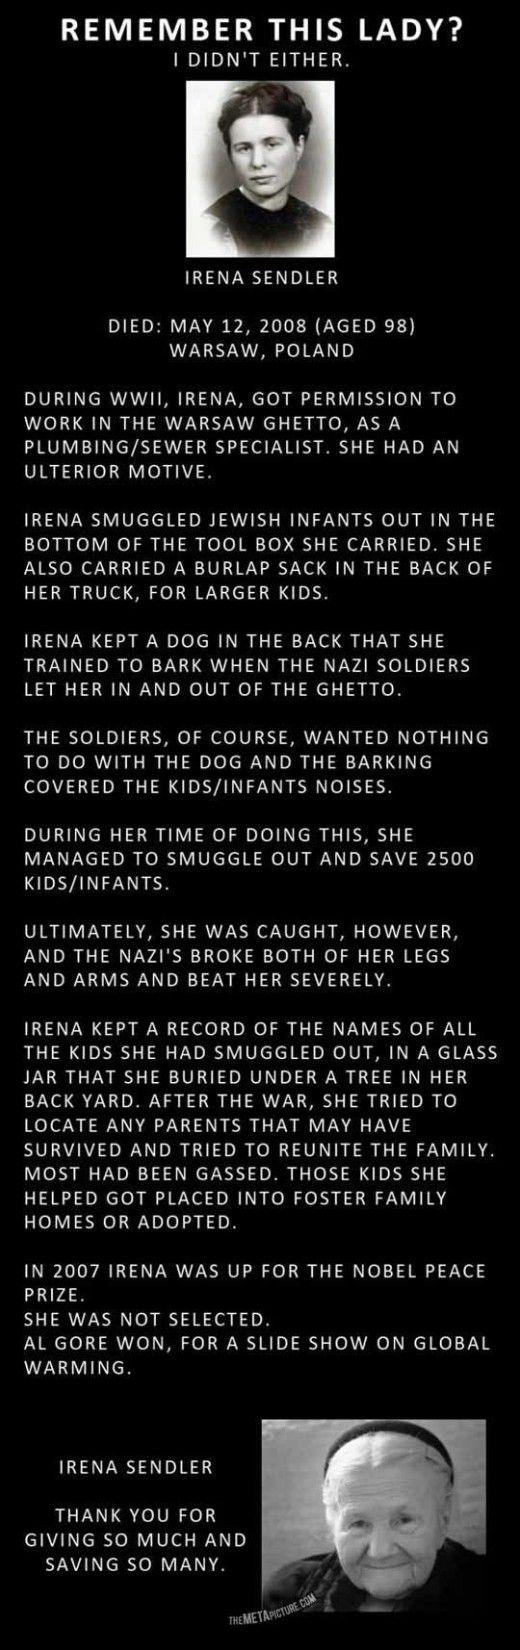 Irena Sendler -- savior of 2500 children in the Warsaw Ghetto